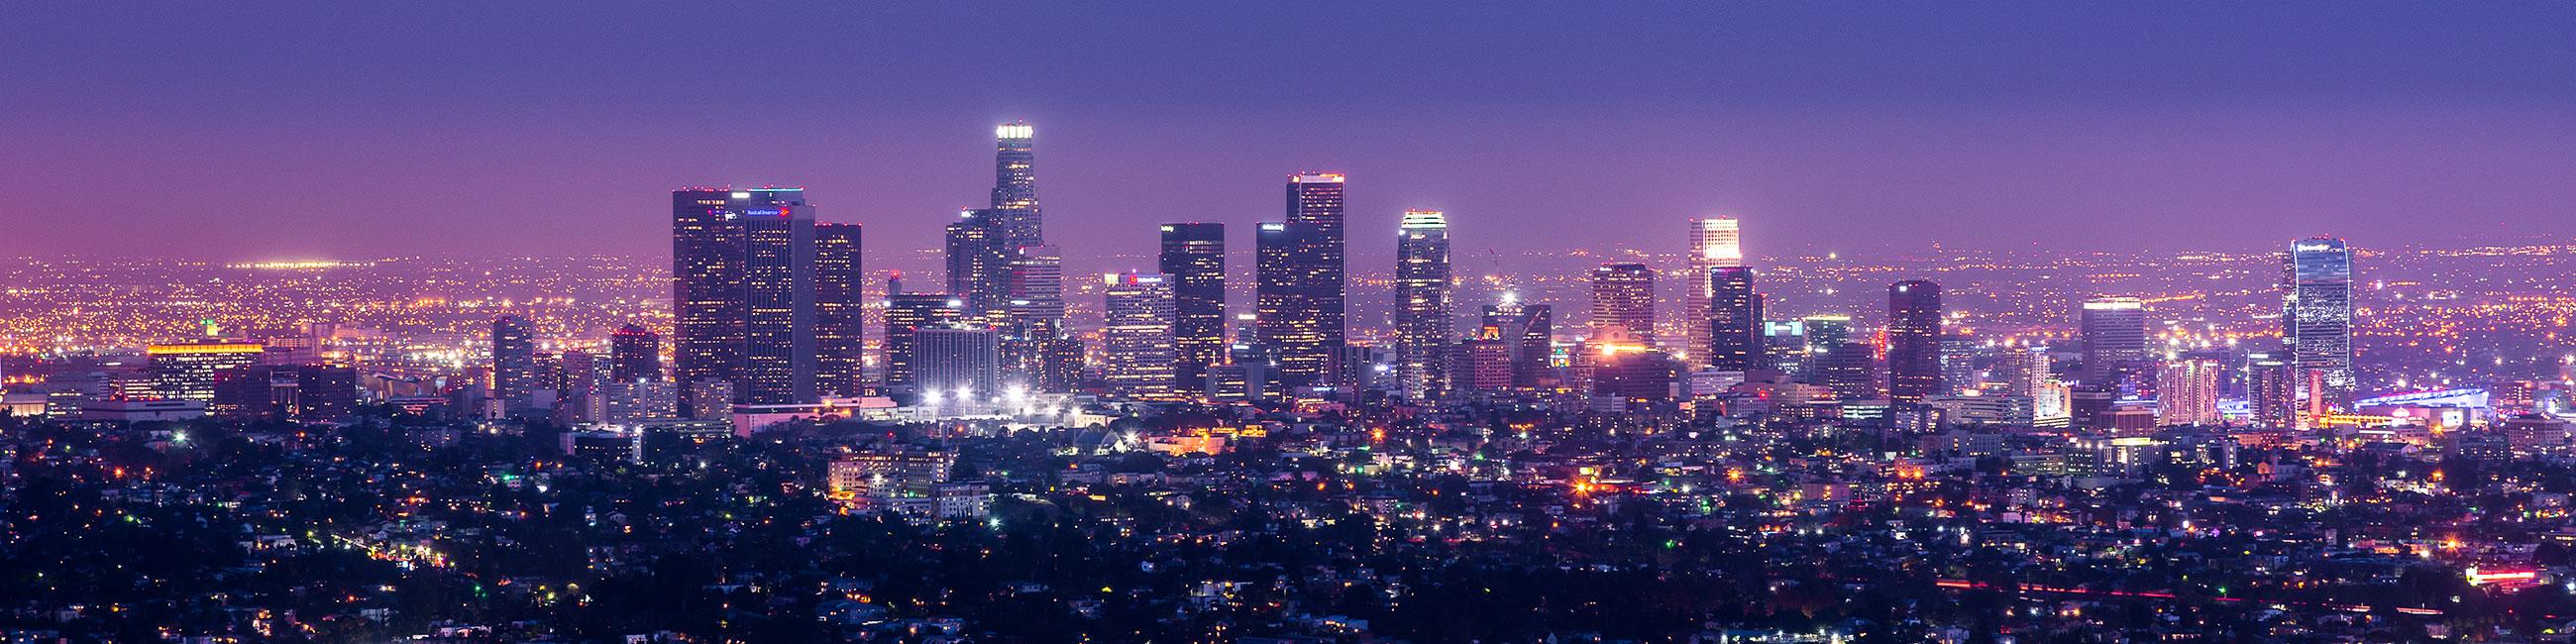 Downtown de Los Angeles